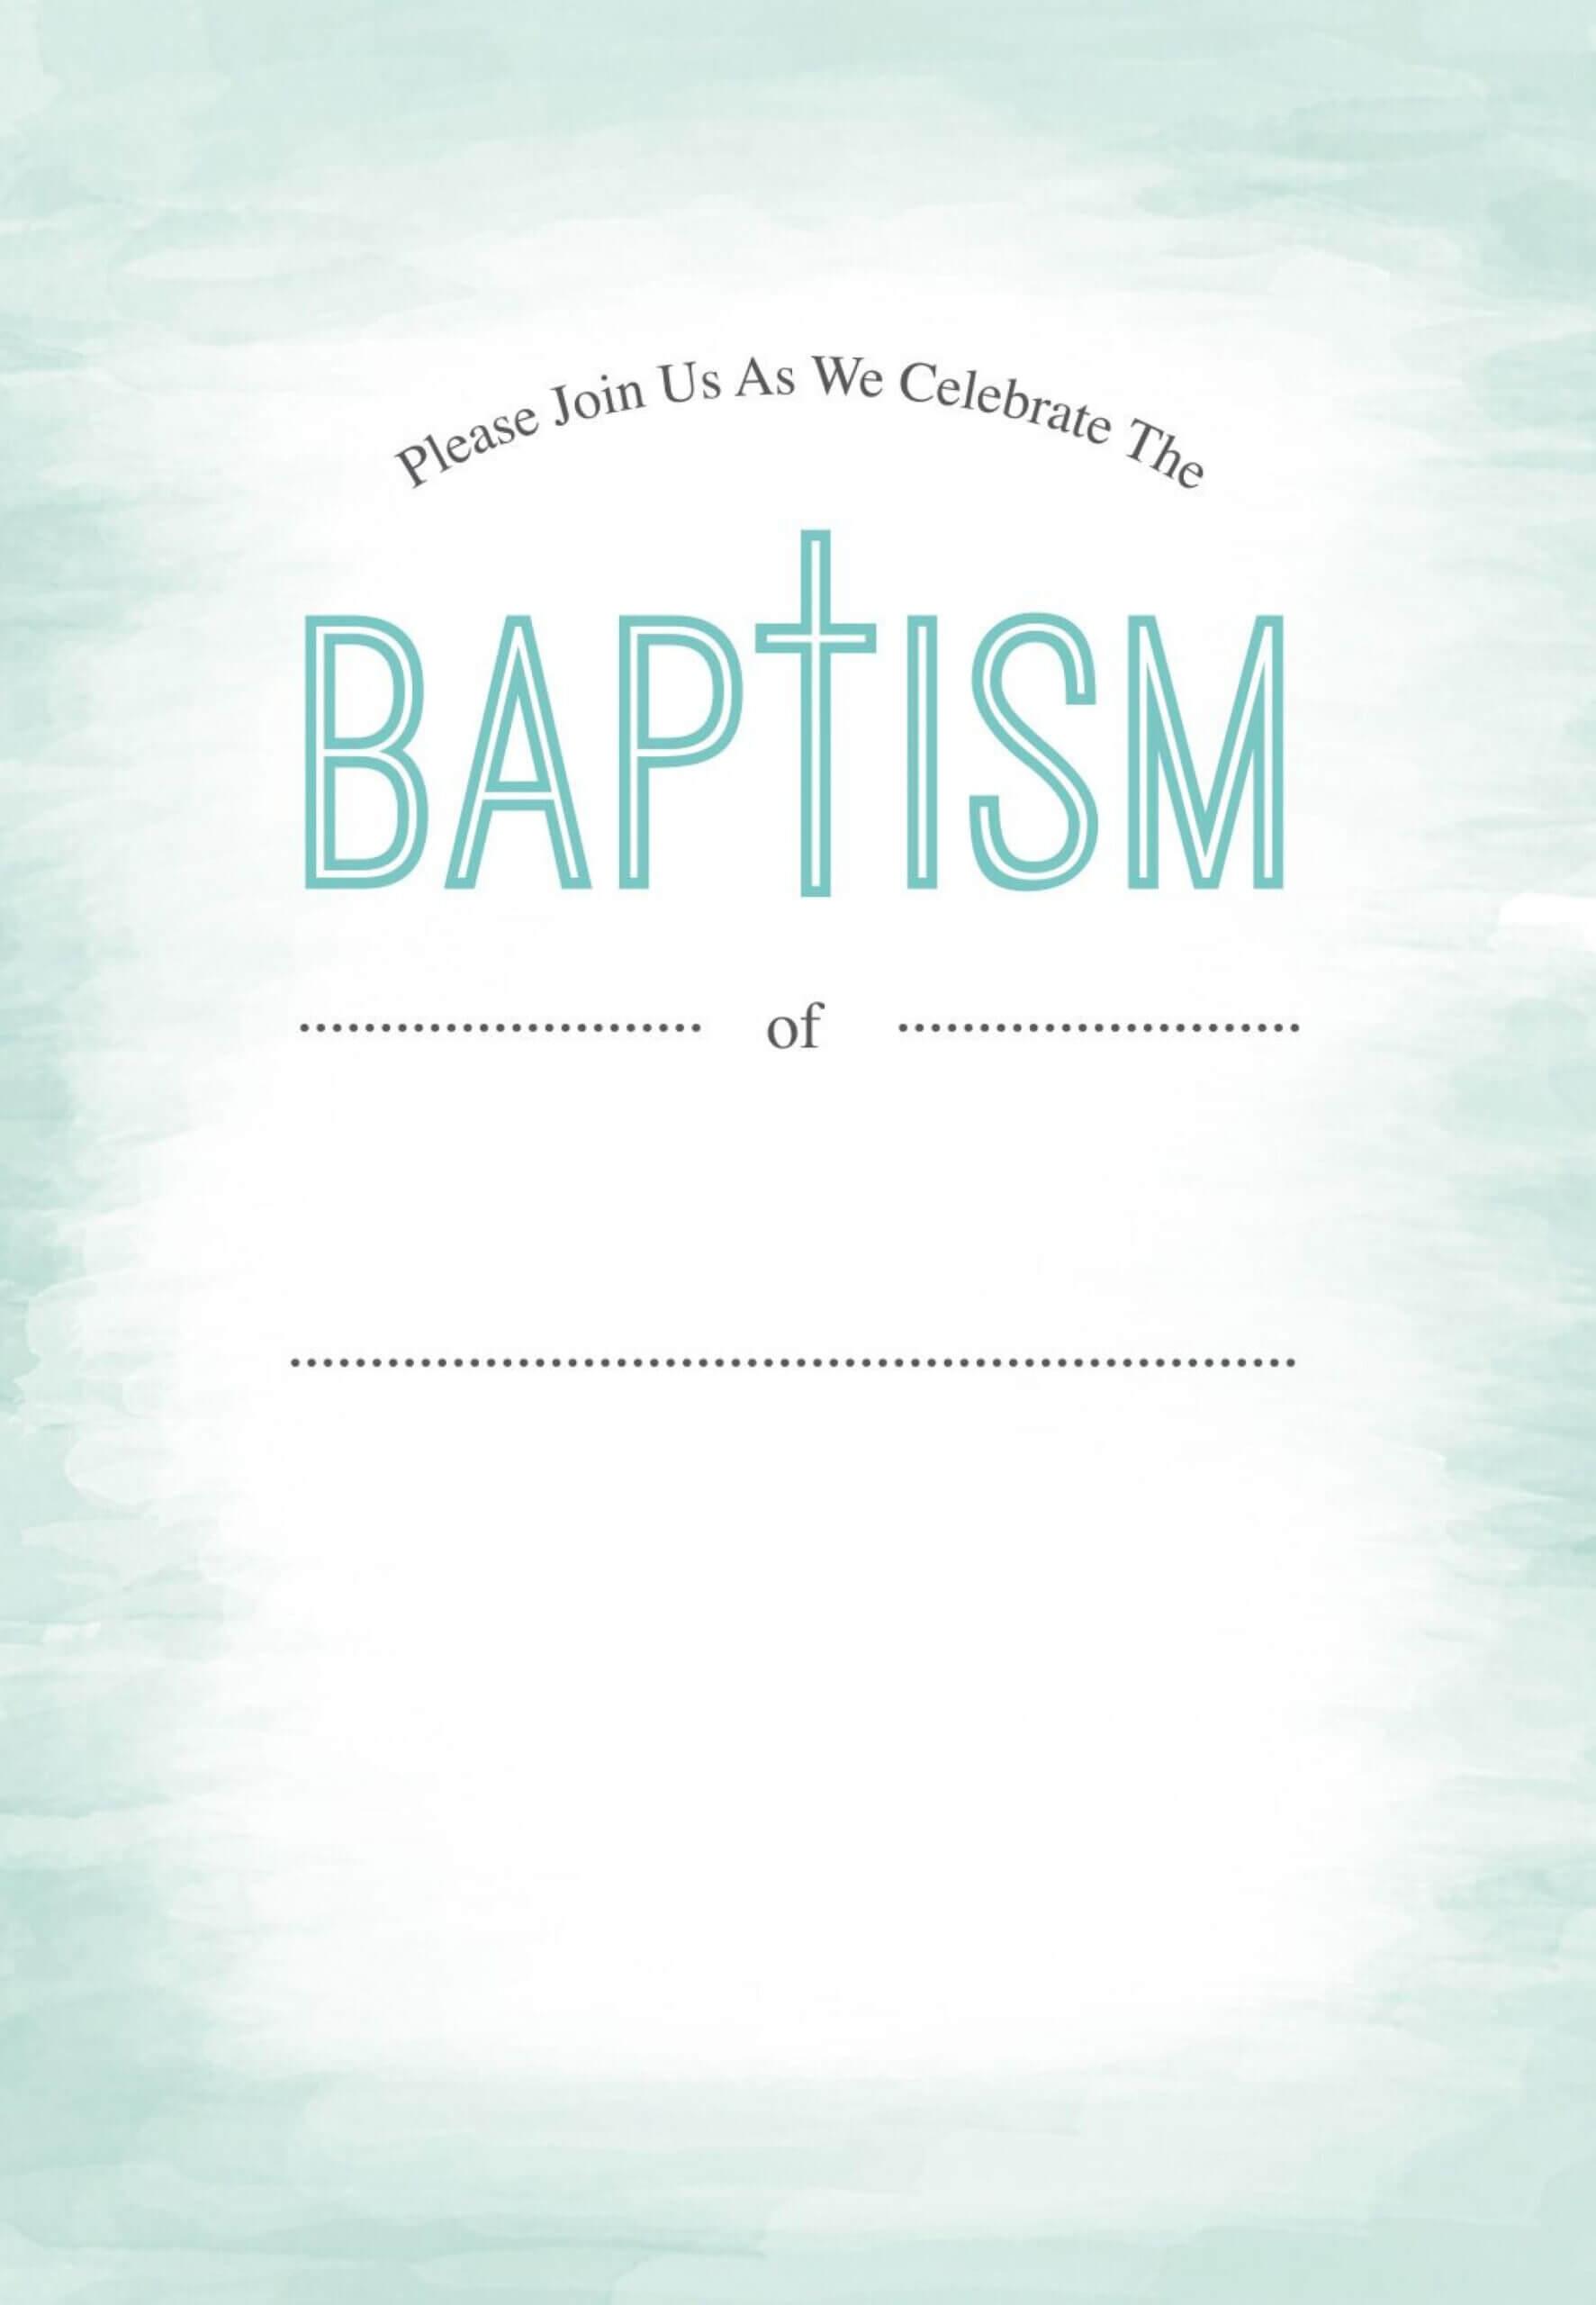 021 Free Baptism Invitation Templates Blank Template With Regard To Blank Christening Invitation Templates